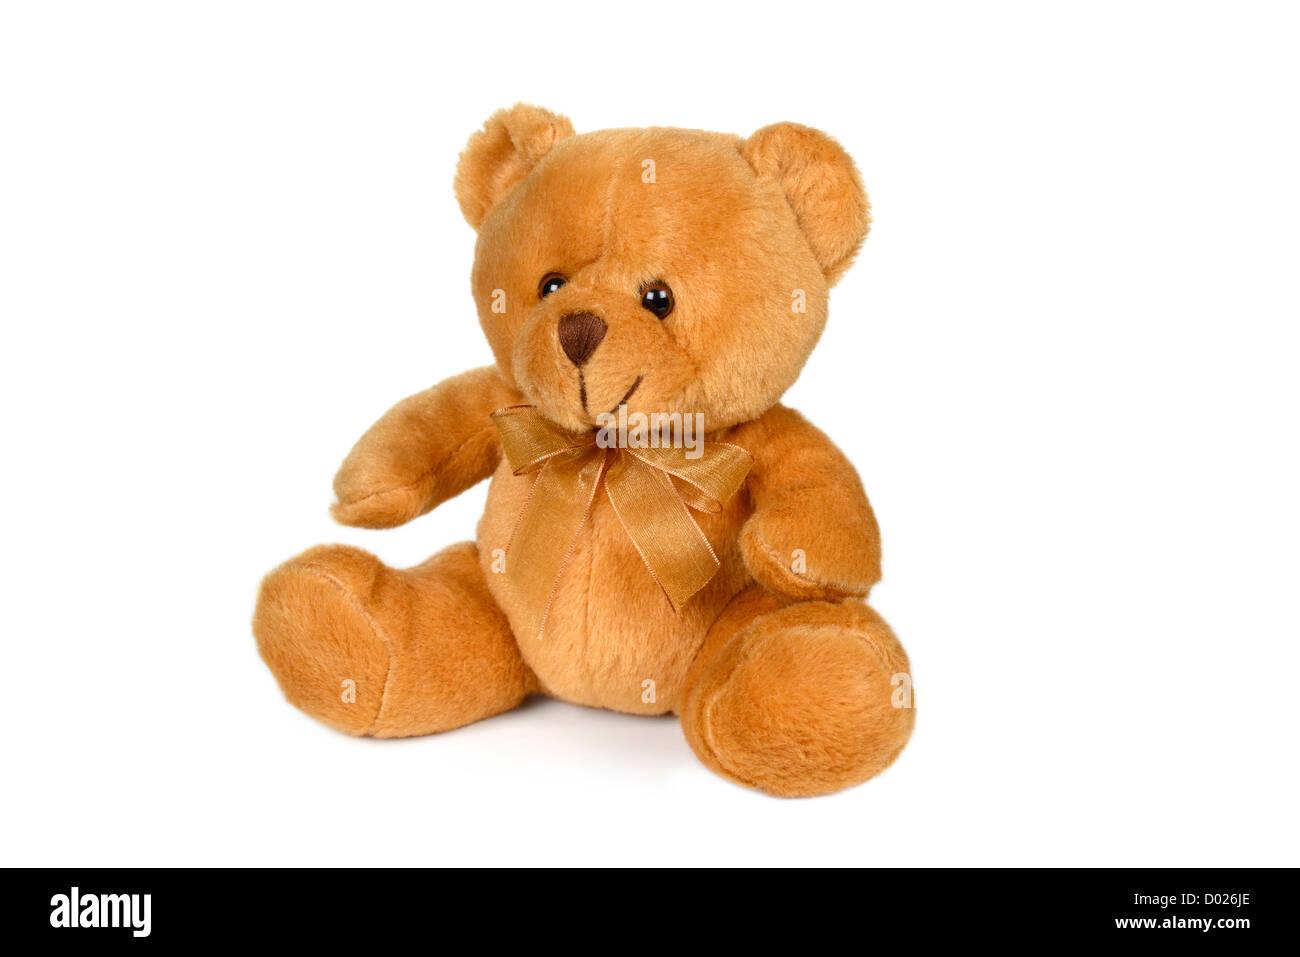 Teddy Bear Toy - Stock Image